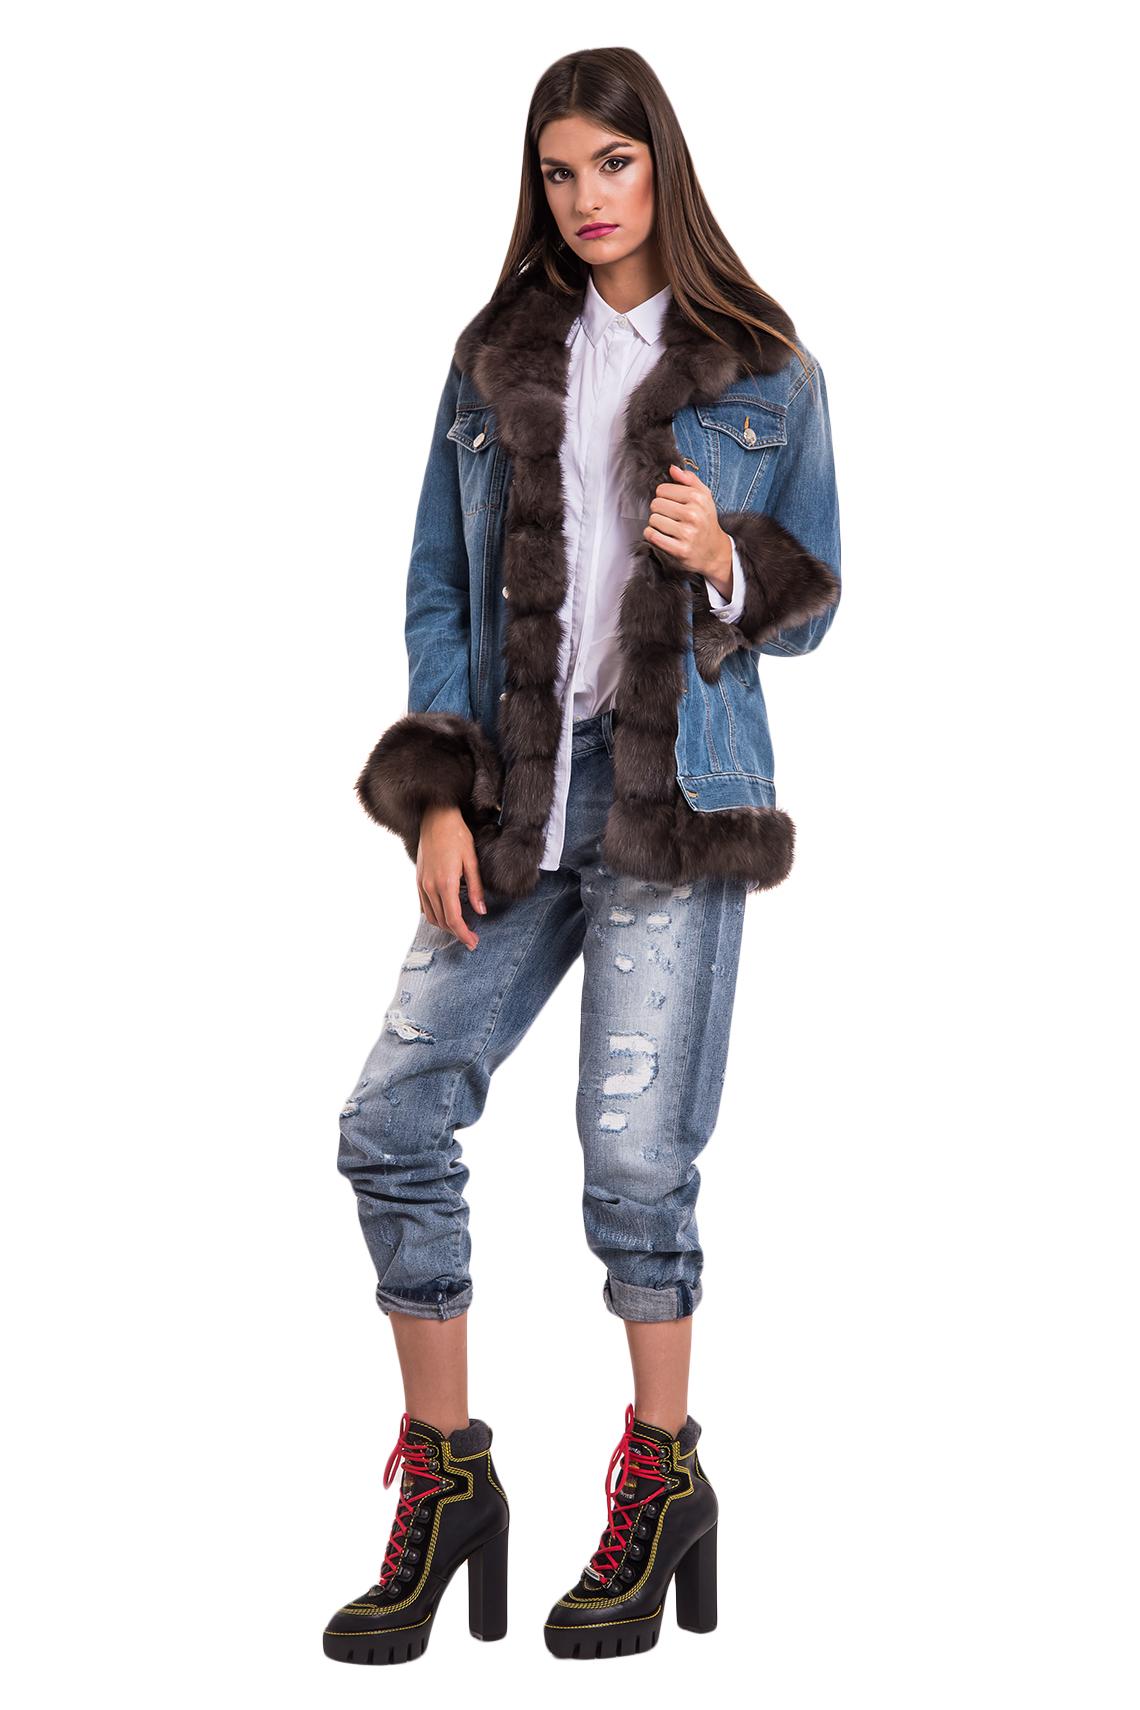 Джинсовая куртка Nello Santi соболь dark Арт 101. Фото 1